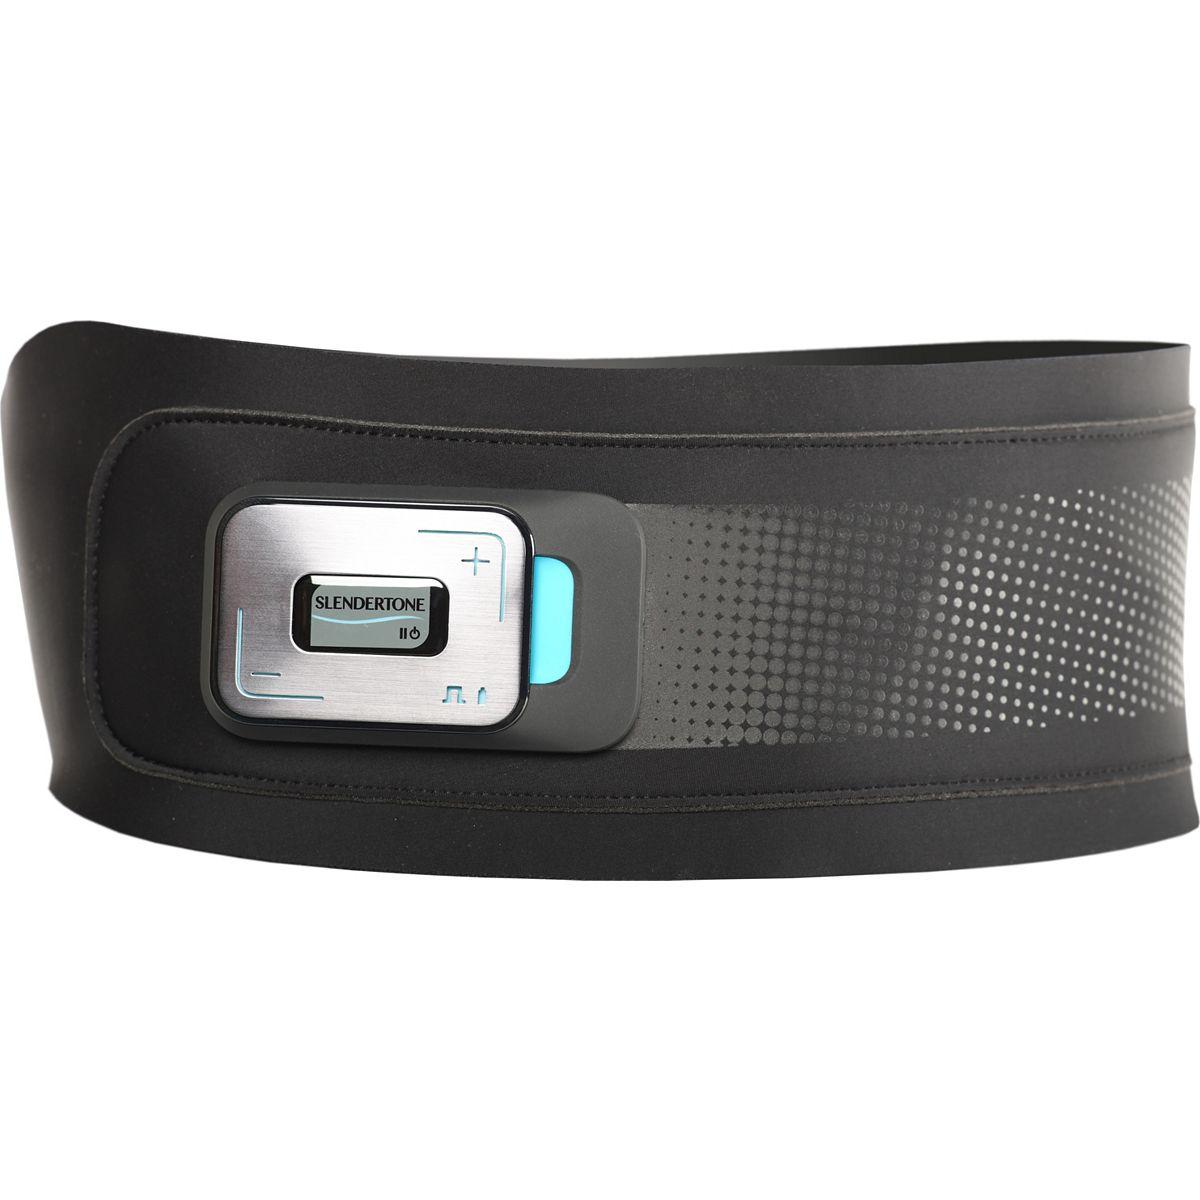 Electro-stim ceinture abdominale slendertone connect abs - livraison offerte : code livpremium (photo)